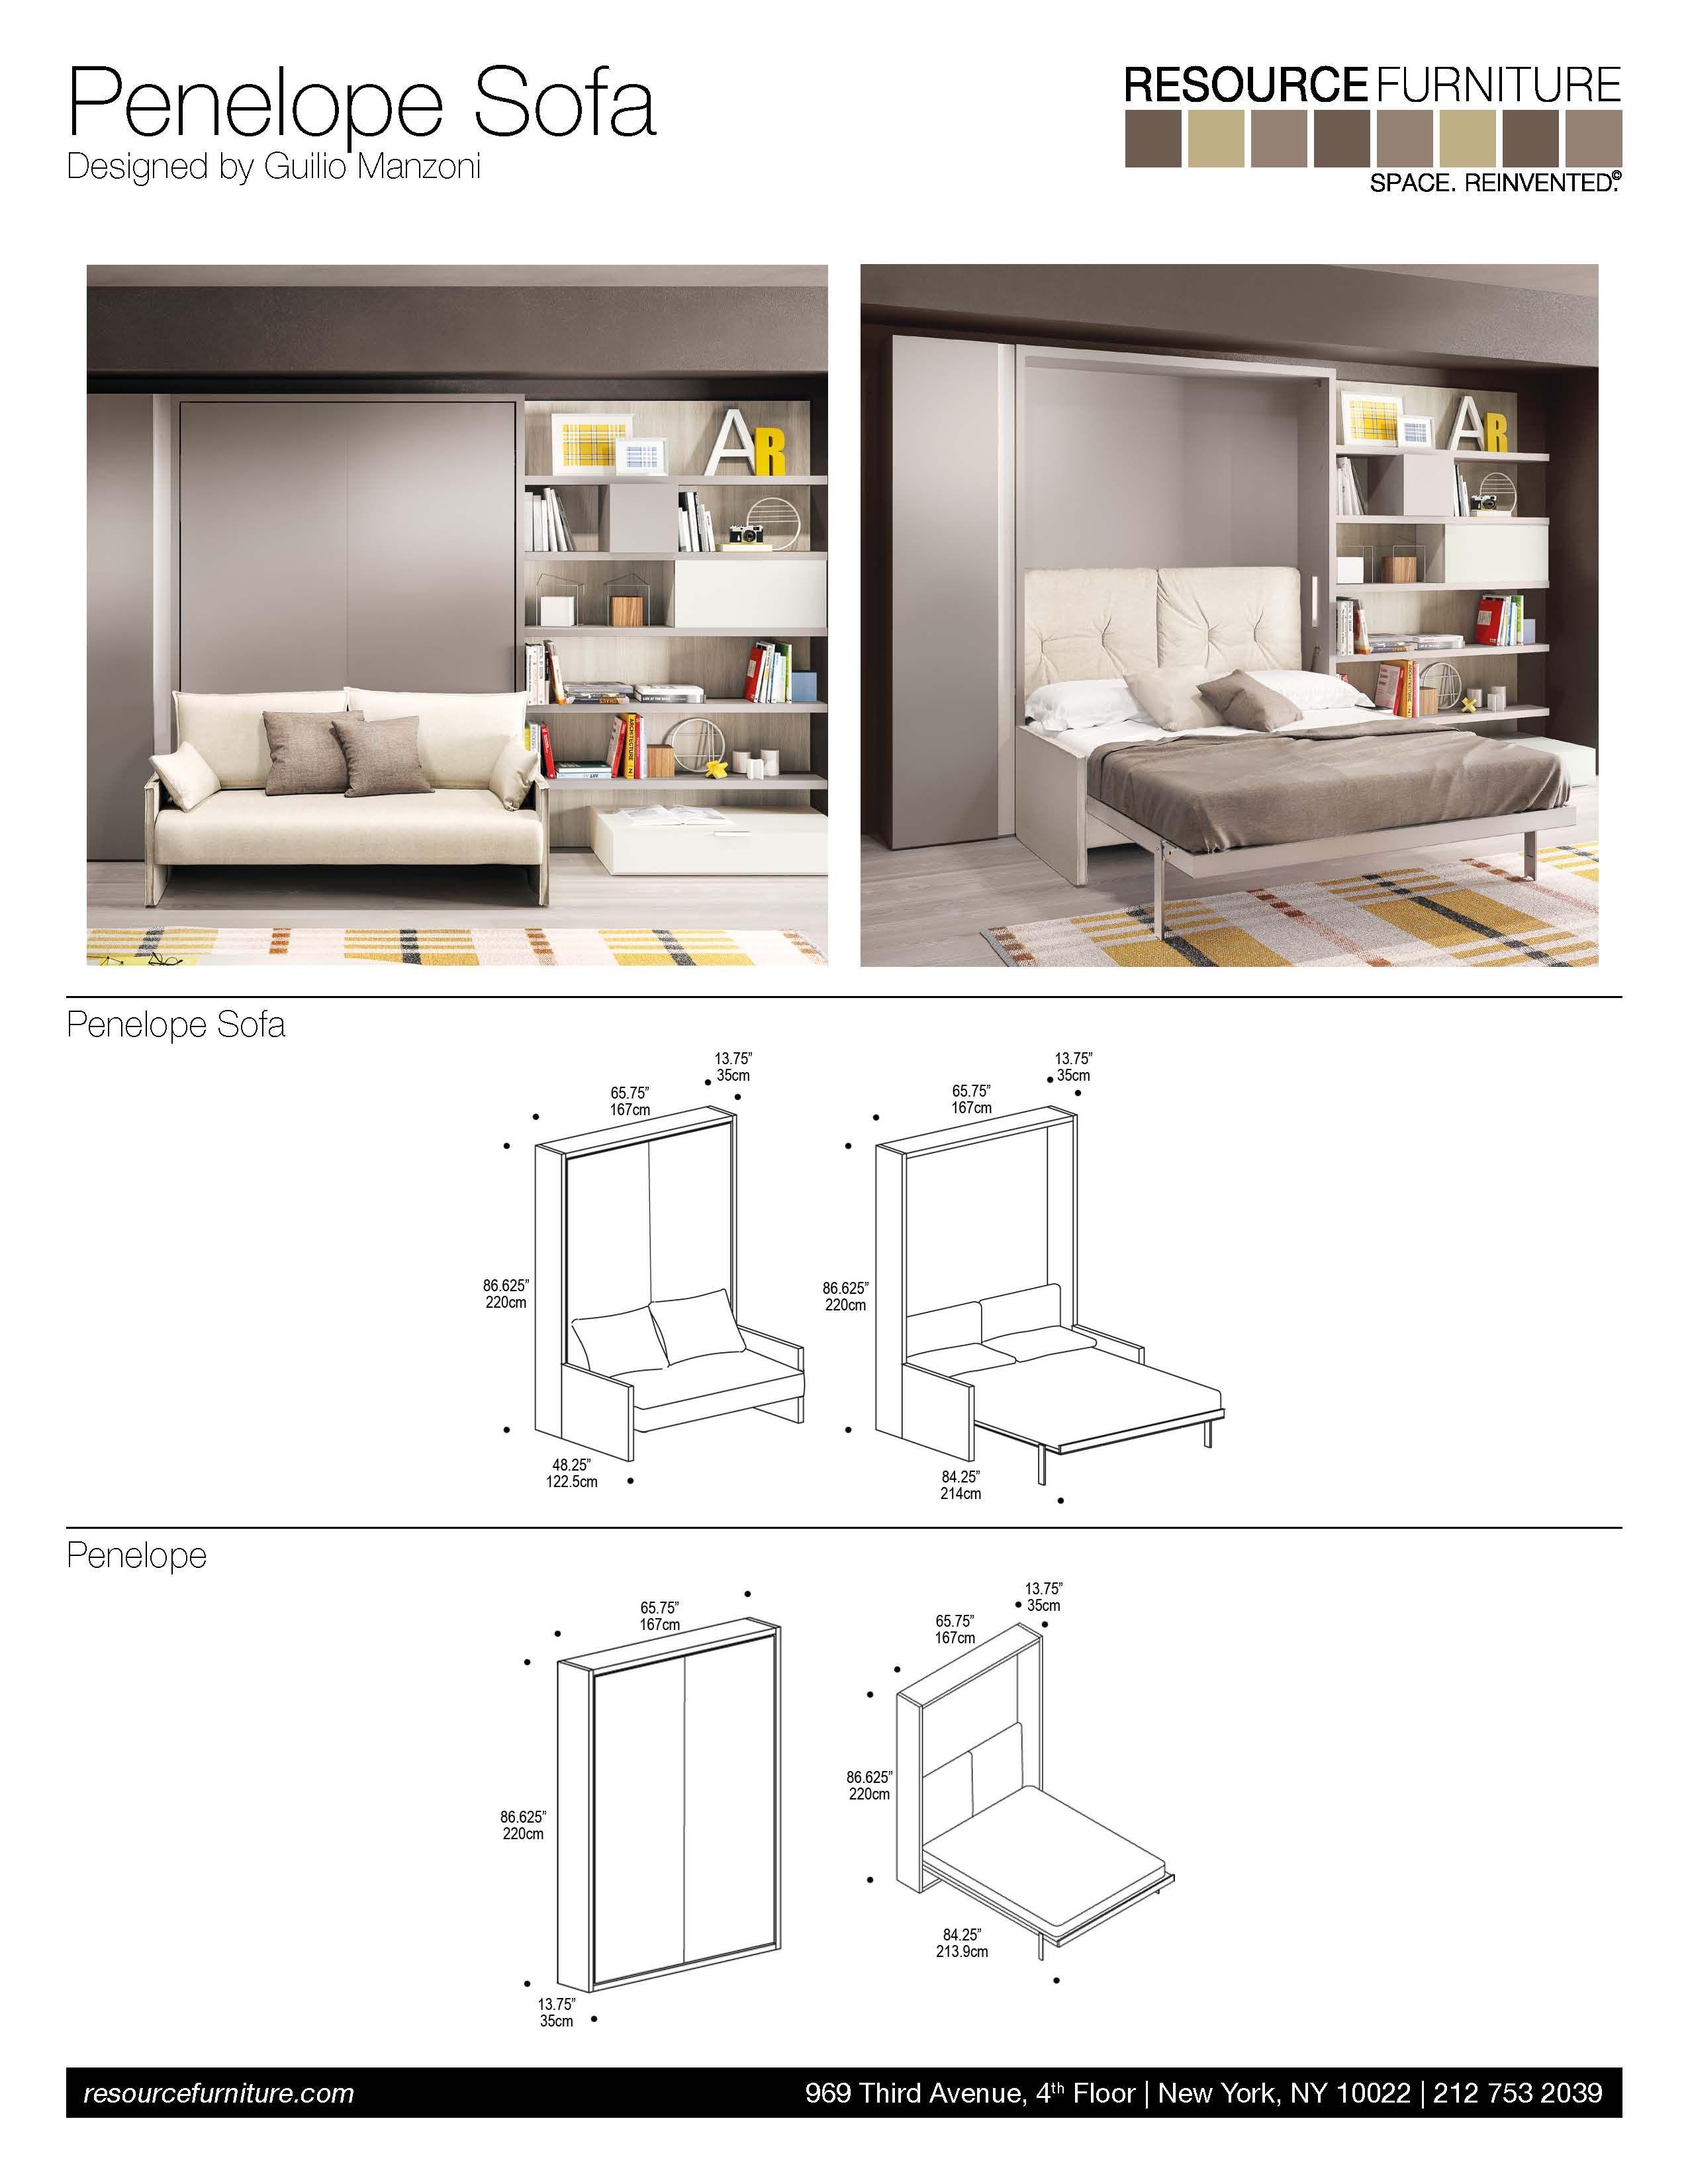 Penelope Sofa  Resource Furniture  Wall Beds & Murphy Beds